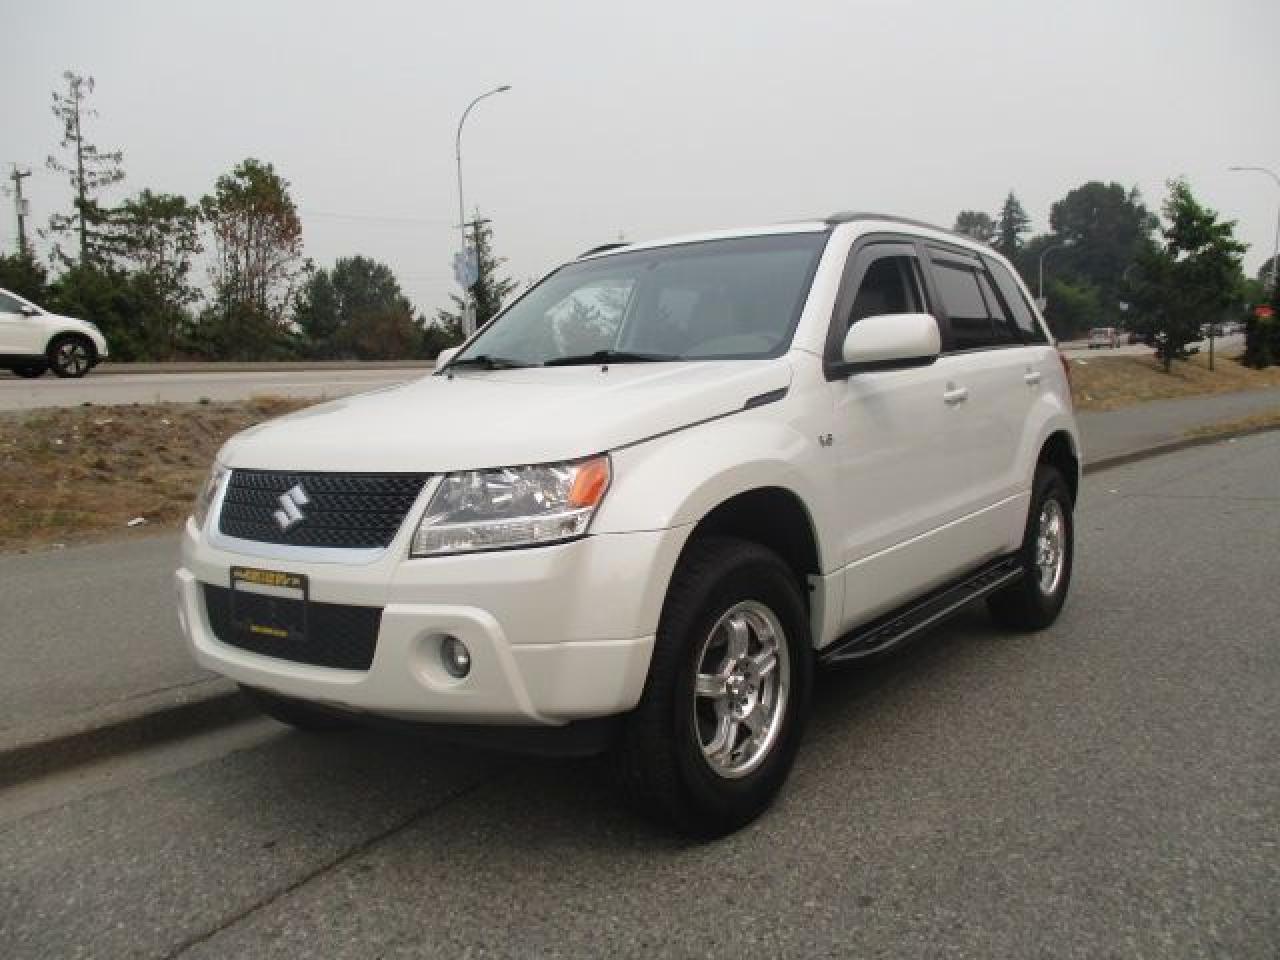 2010 Suzuki Grand Vitara JLX-L